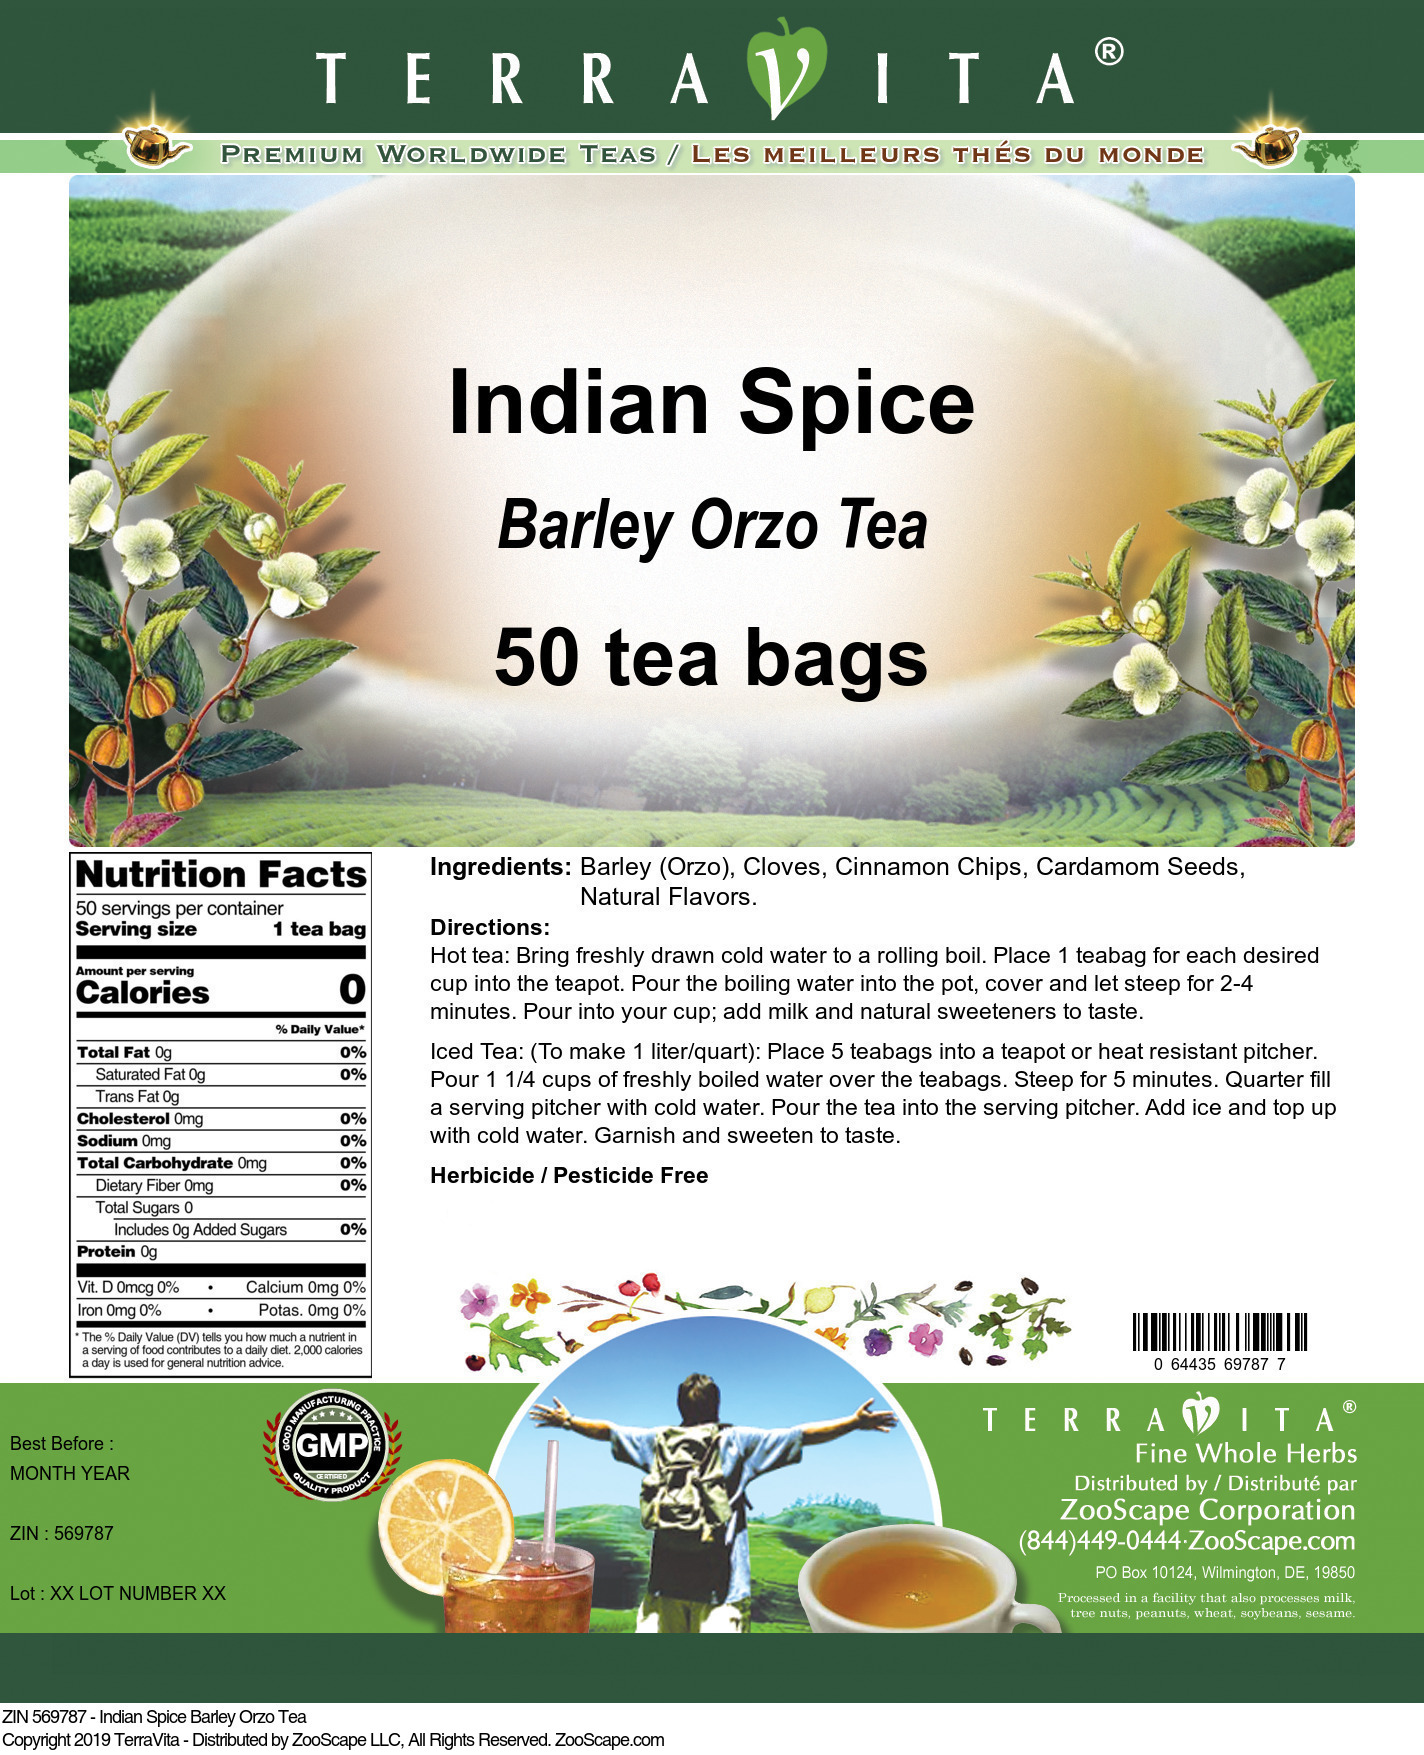 Indian Spice Barley Orzo Tea